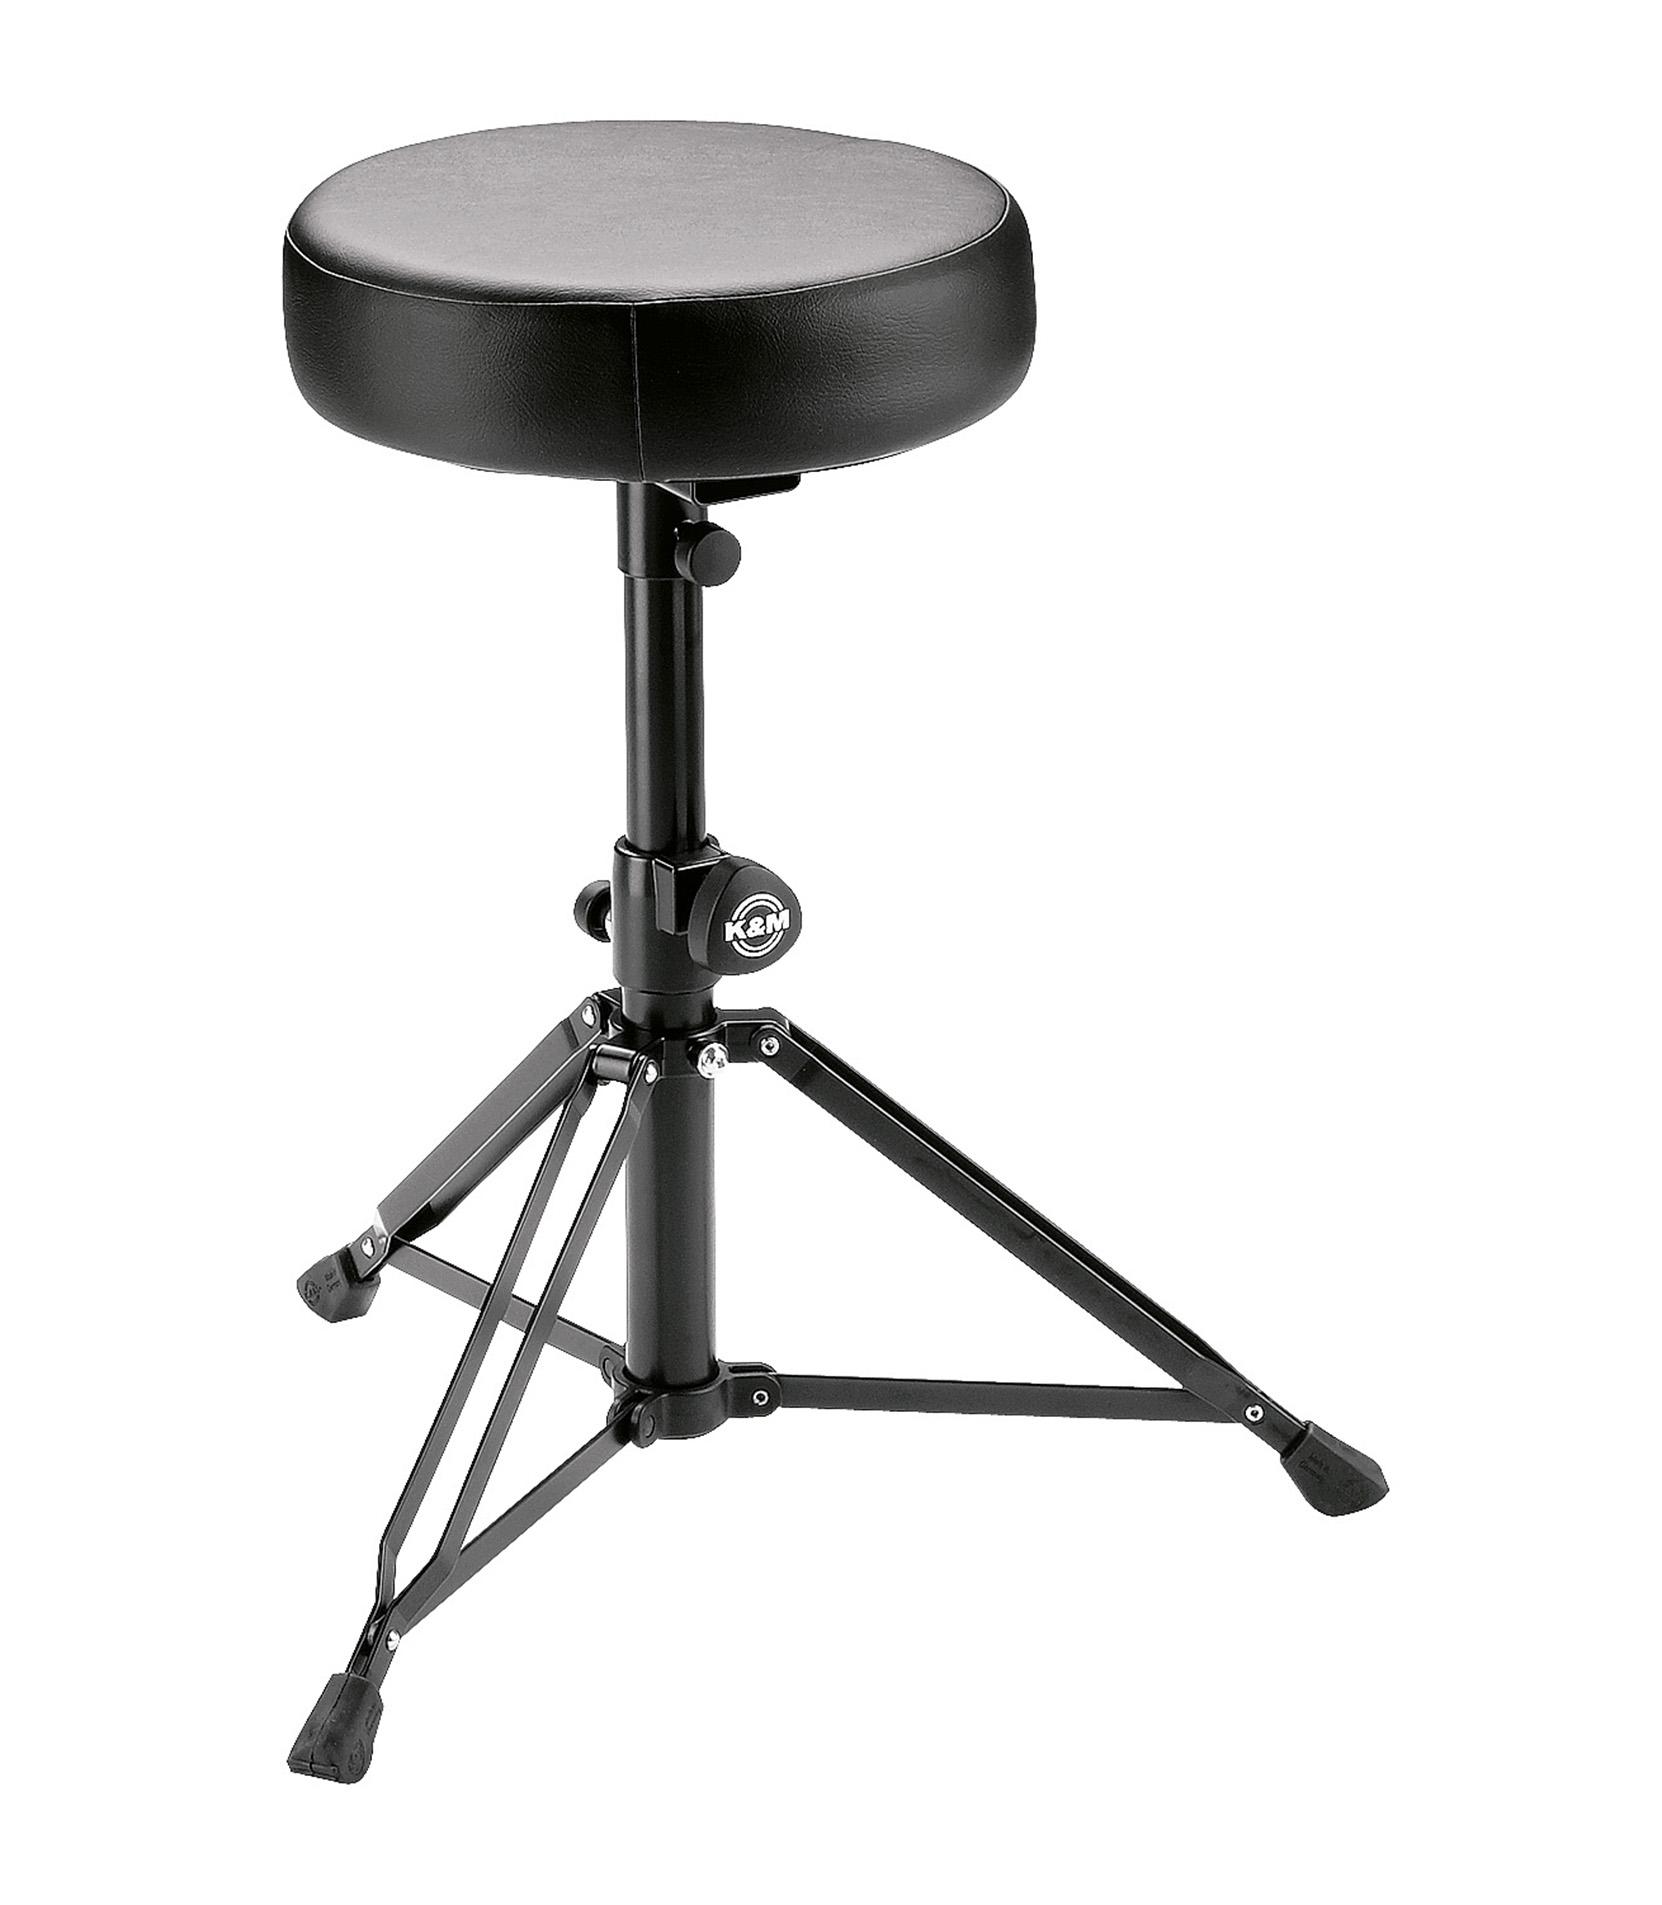 buy k&m 14015 000 55 drummers throneblack leather